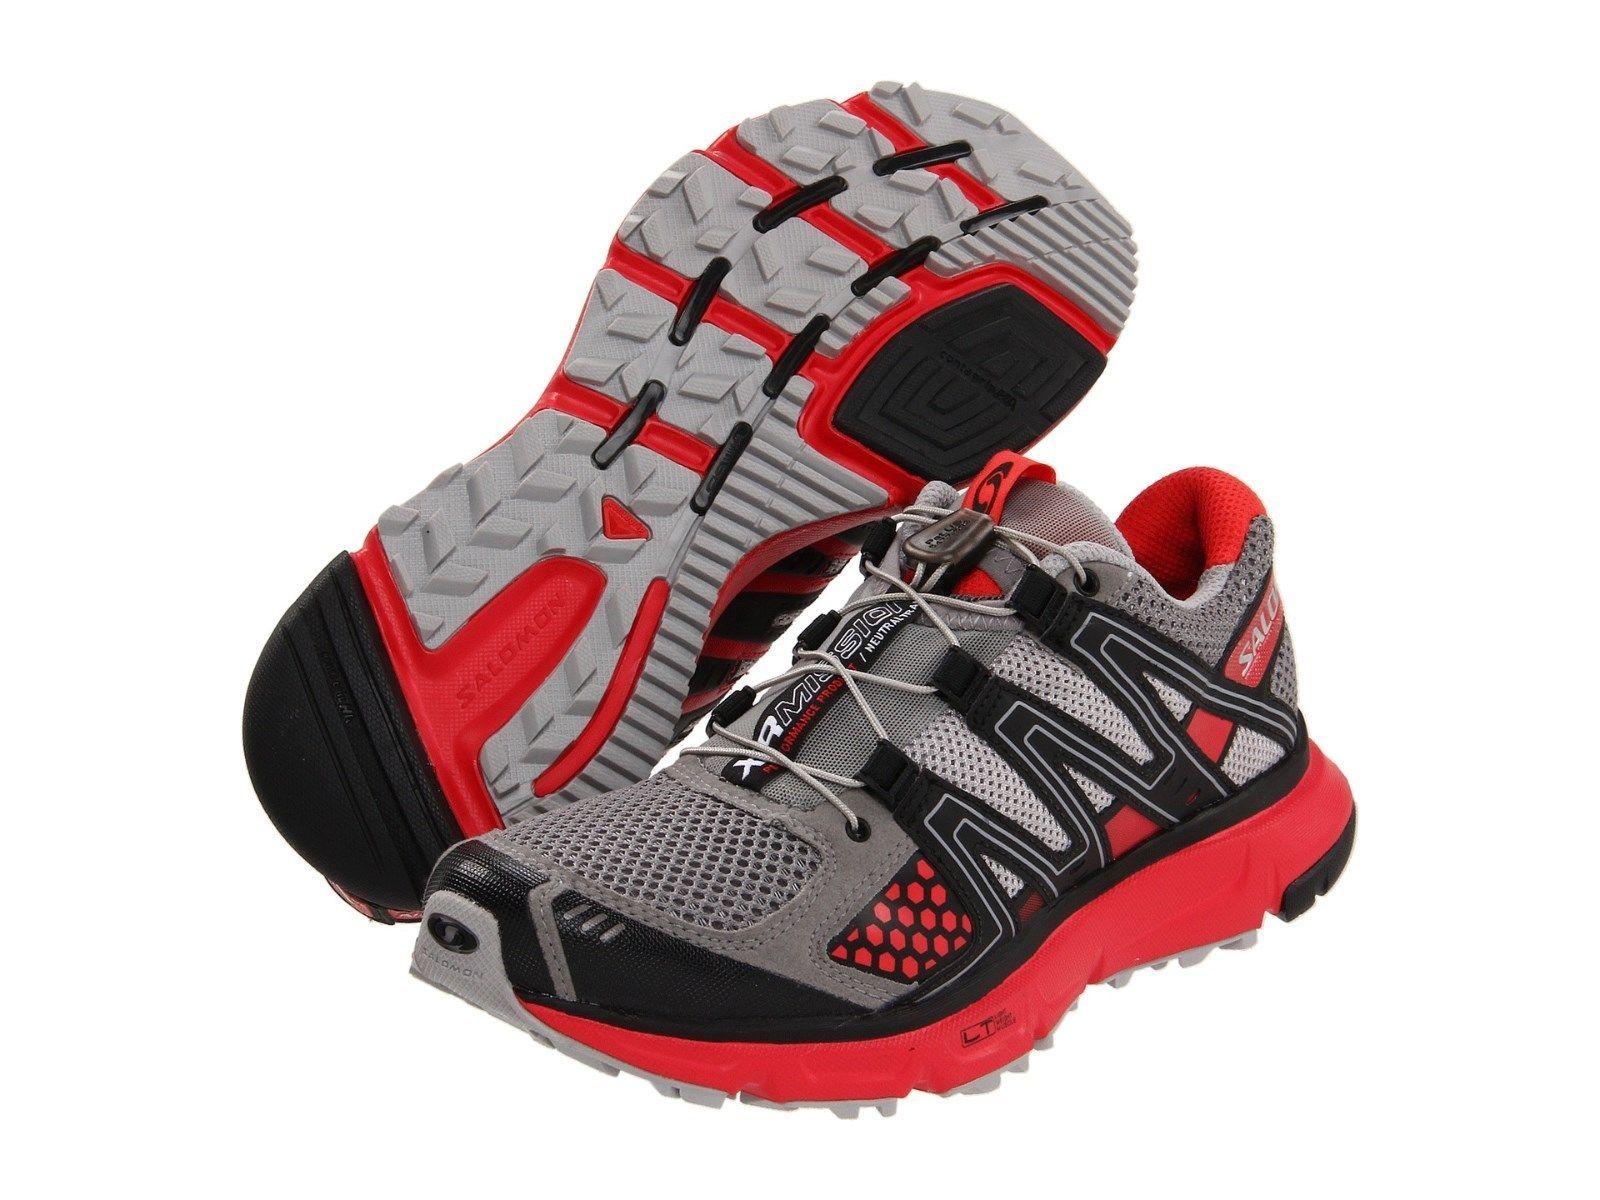 6921132a55960 Women s Salomon XR Mission W Trail Running Shoes US 10.5 Medium ...